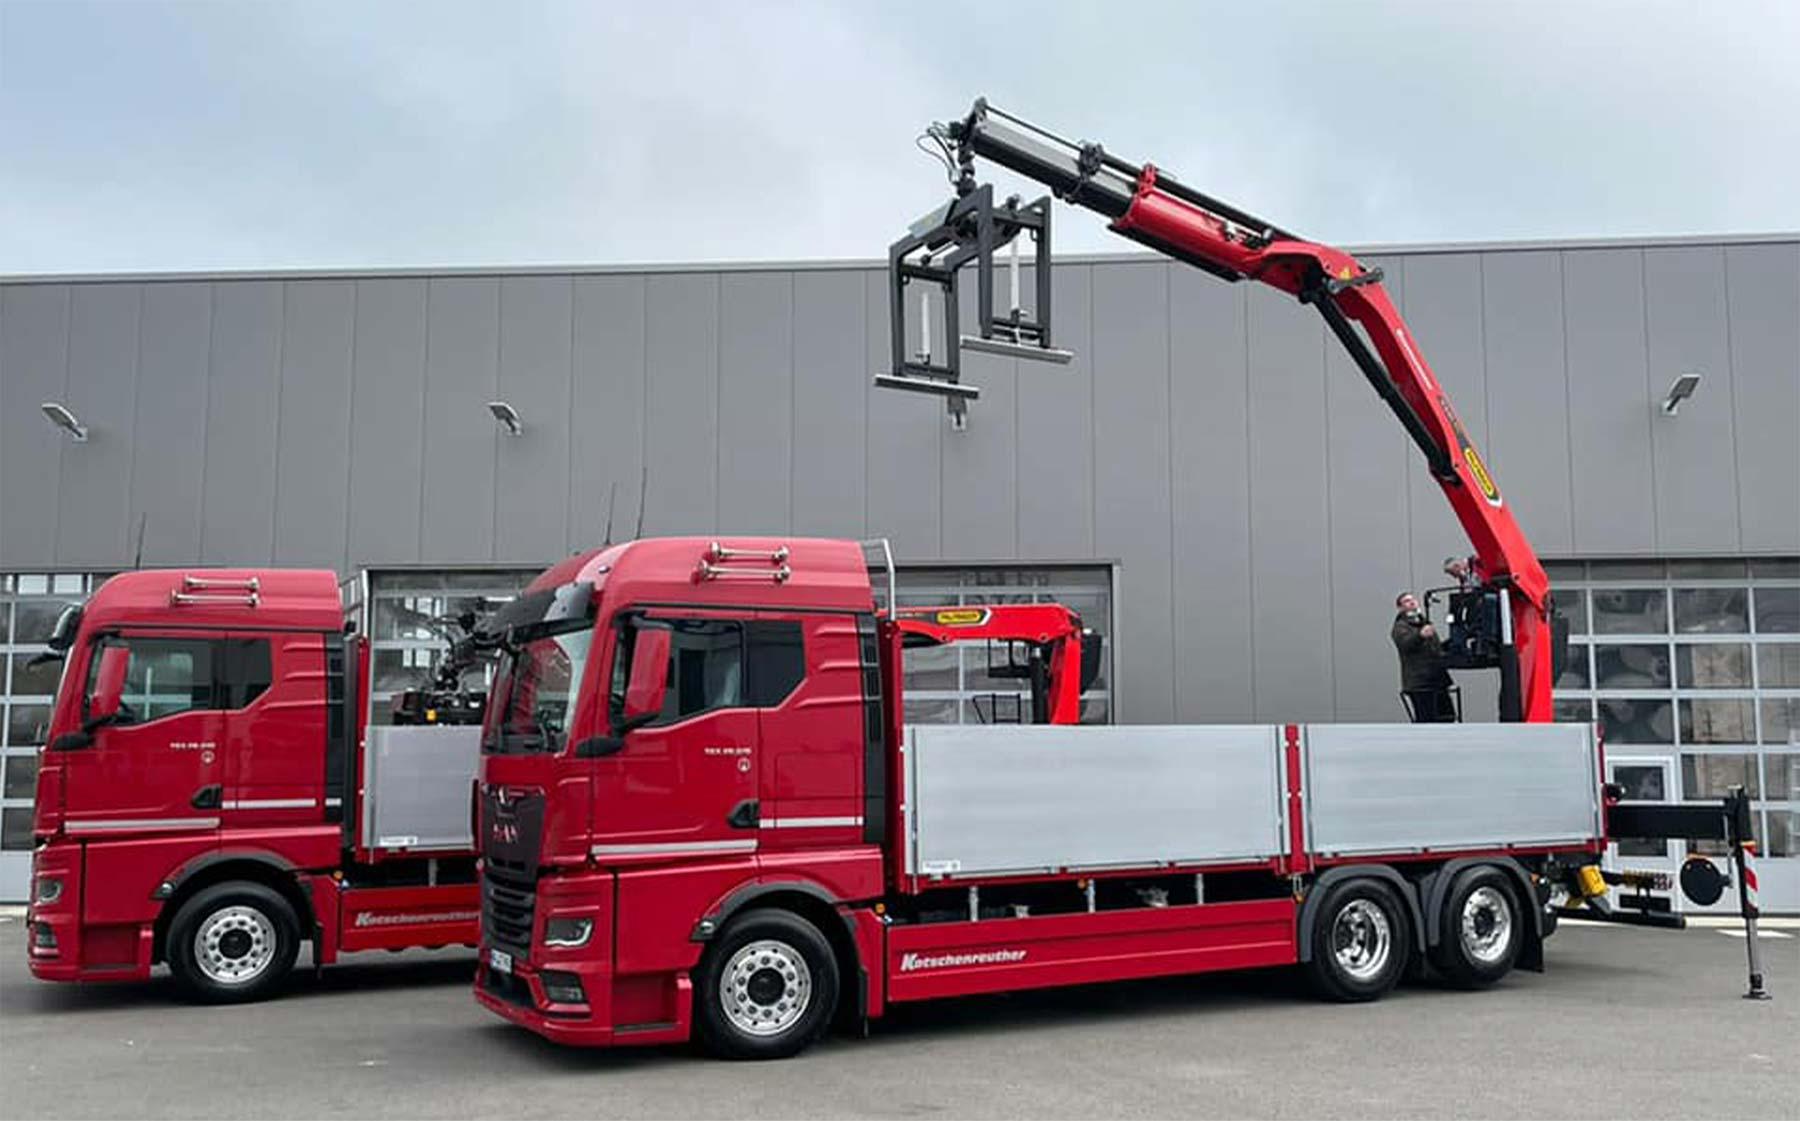 LKW mit Baustoffkran